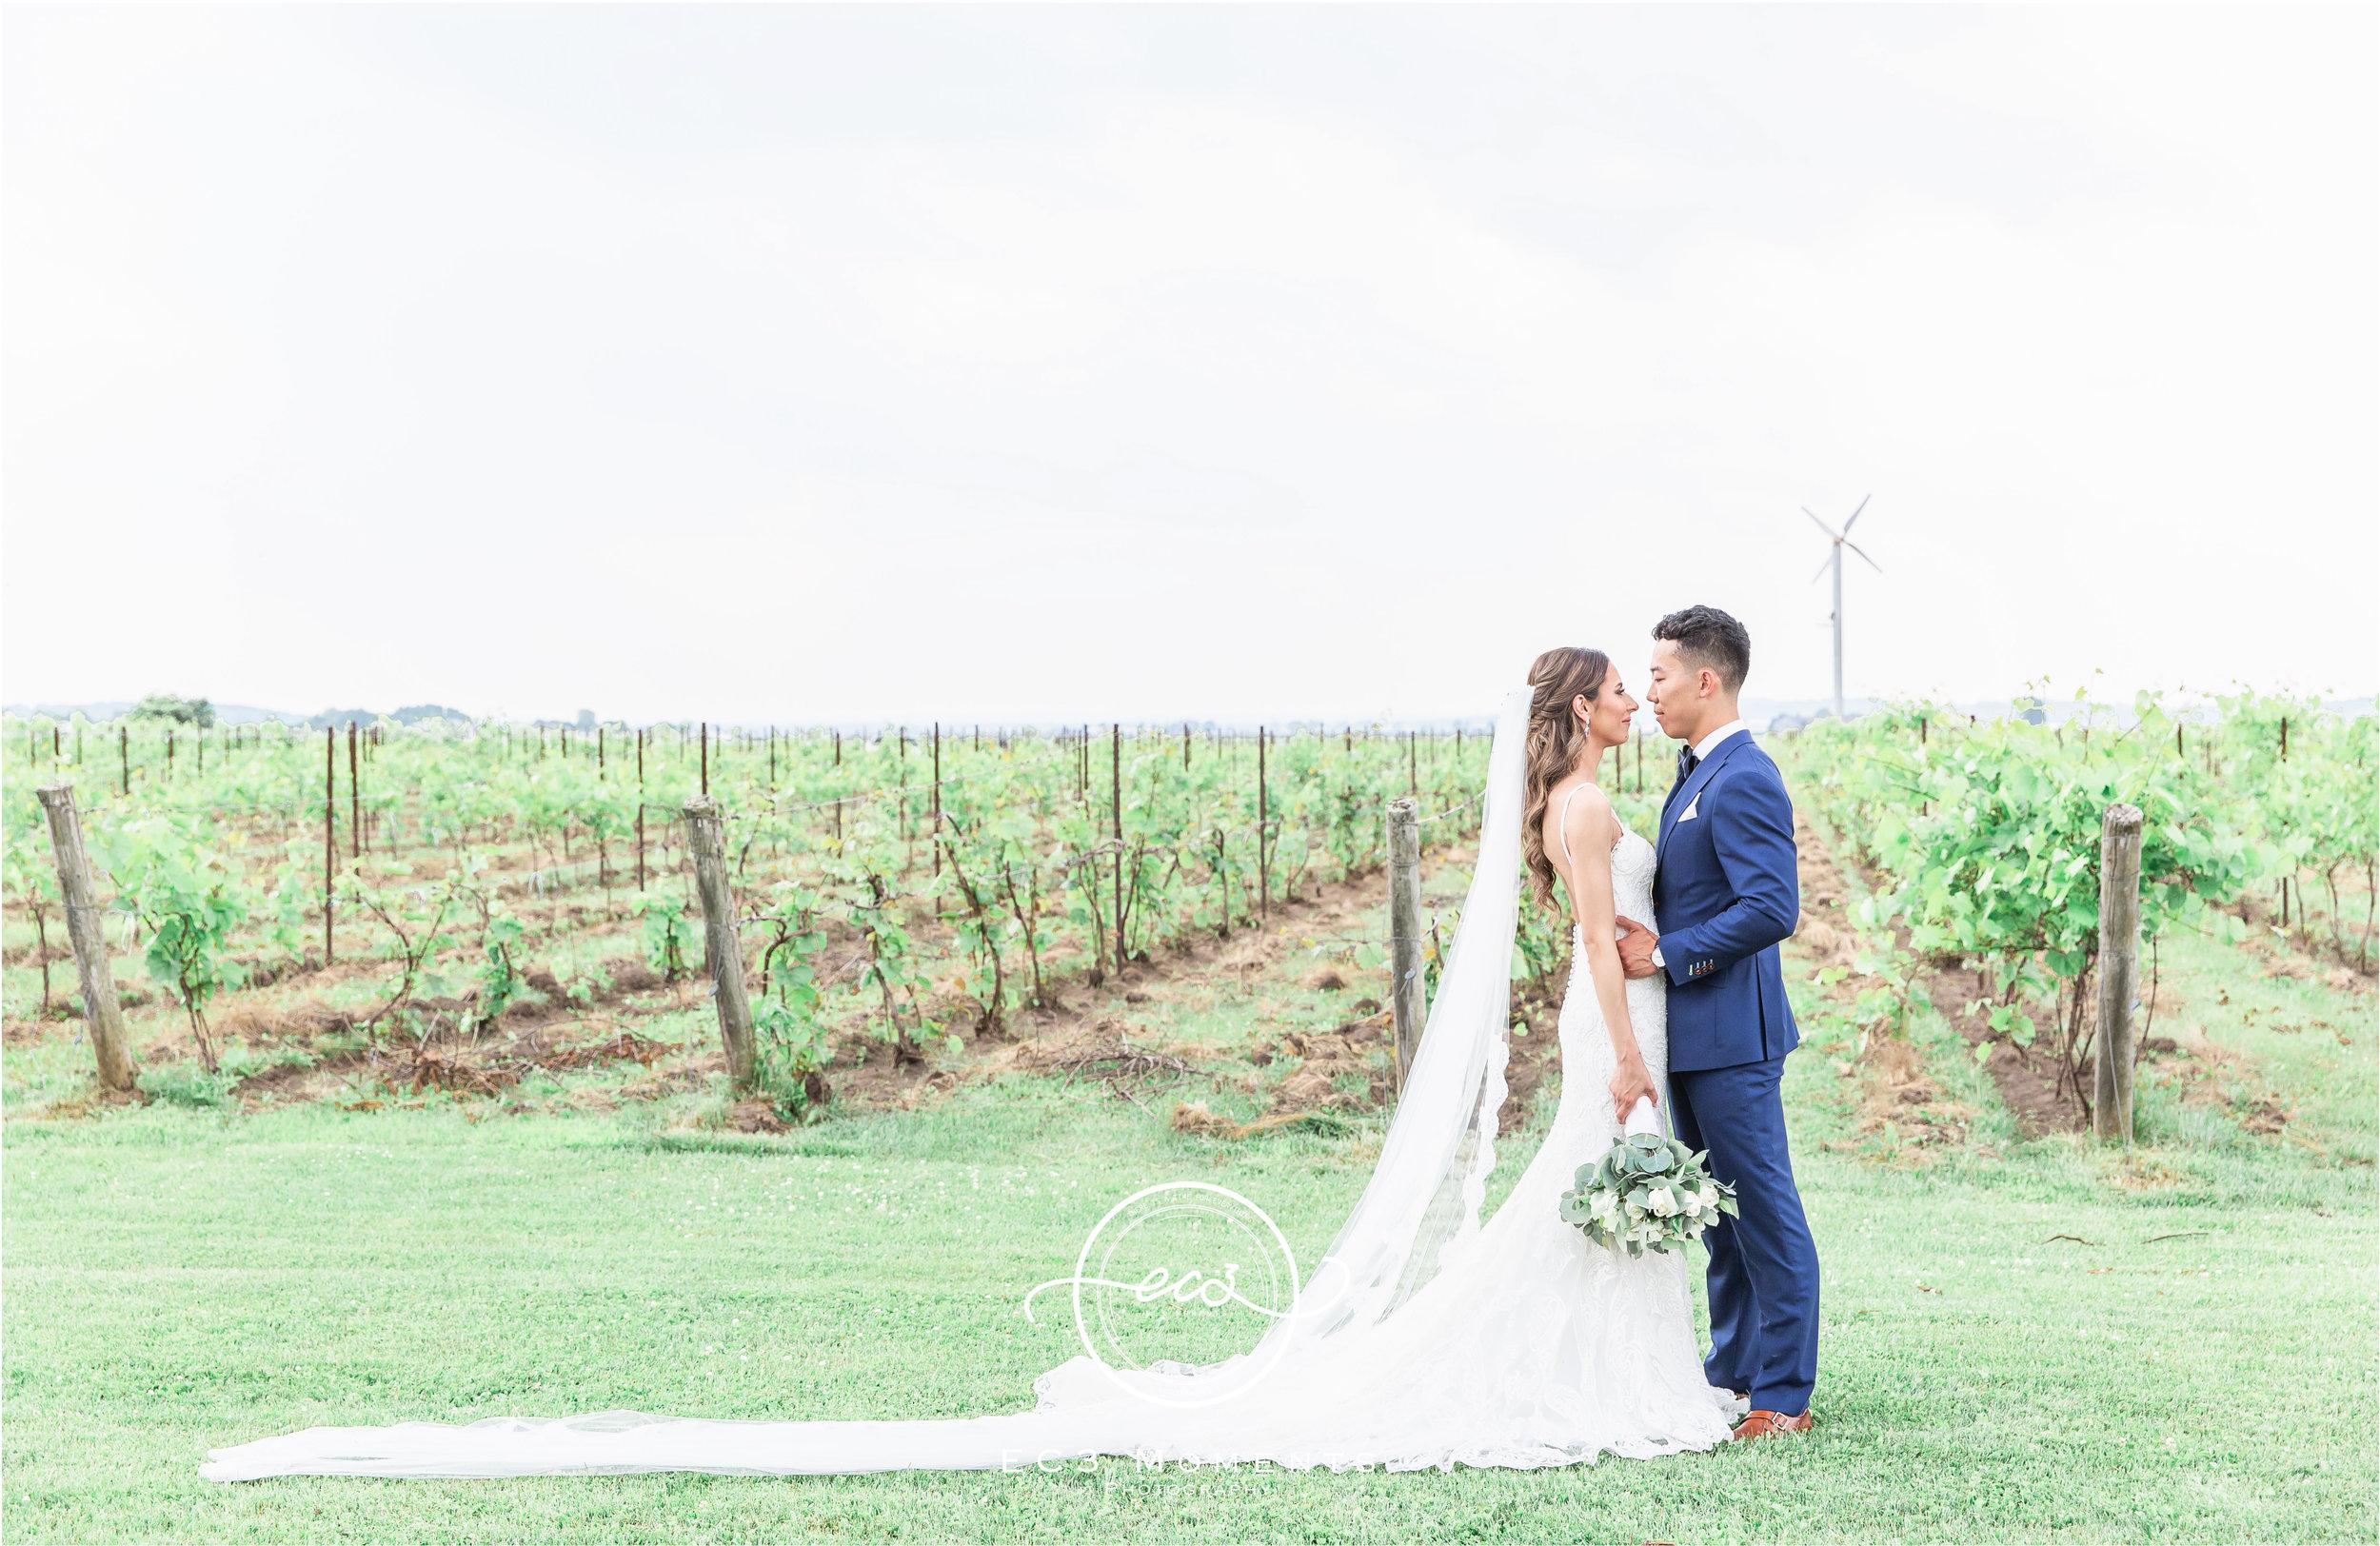 Laura & Ryan Holland Marsh Wineries Wedding 30.jpg